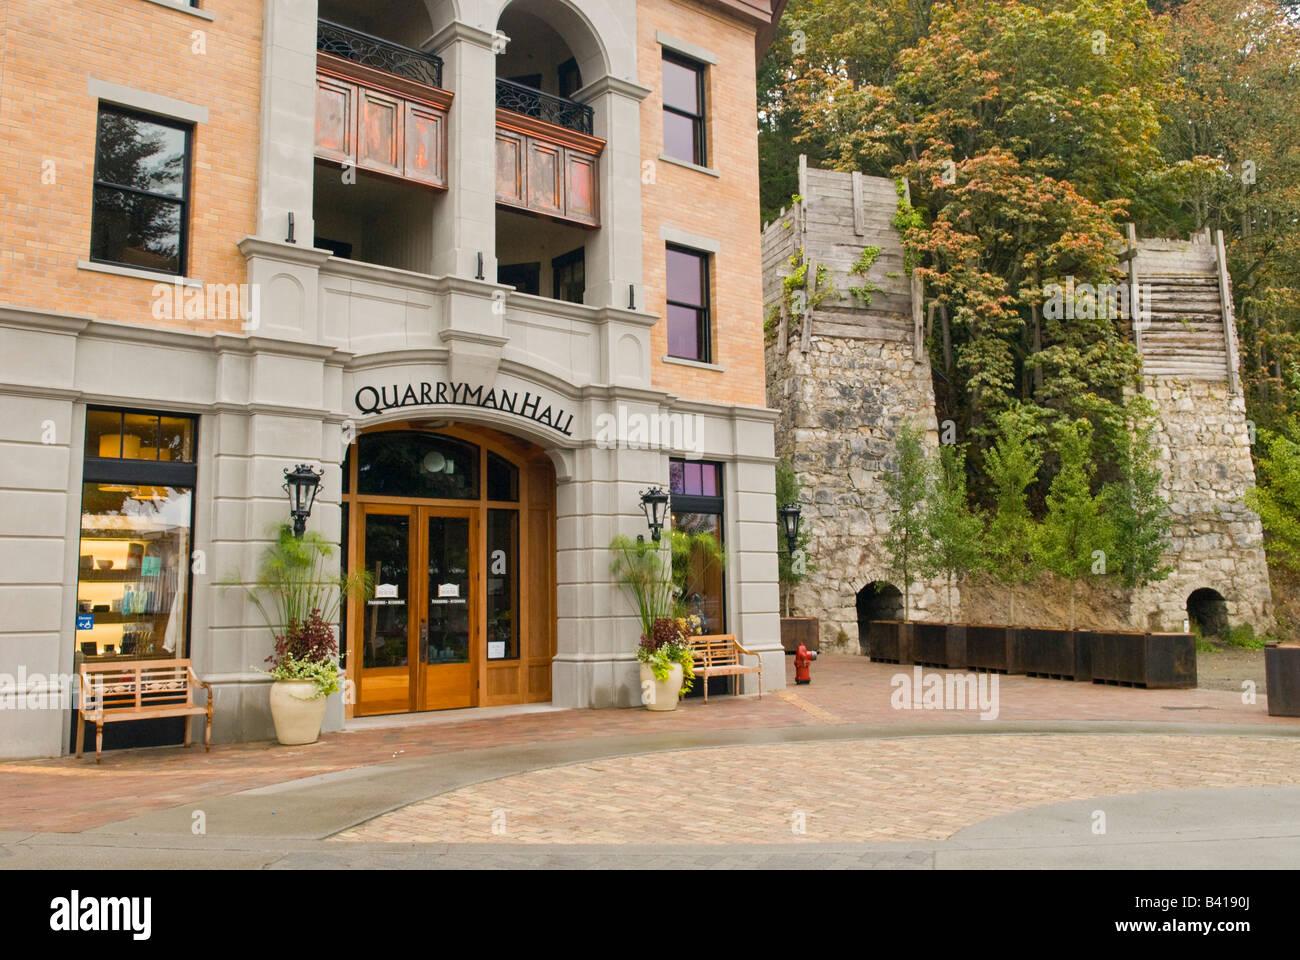 USA, WA, San Juan Island.  Quarryman Hall is new addition to Roche Harbor resort.  Stands next to old lime kilns. - Stock Image